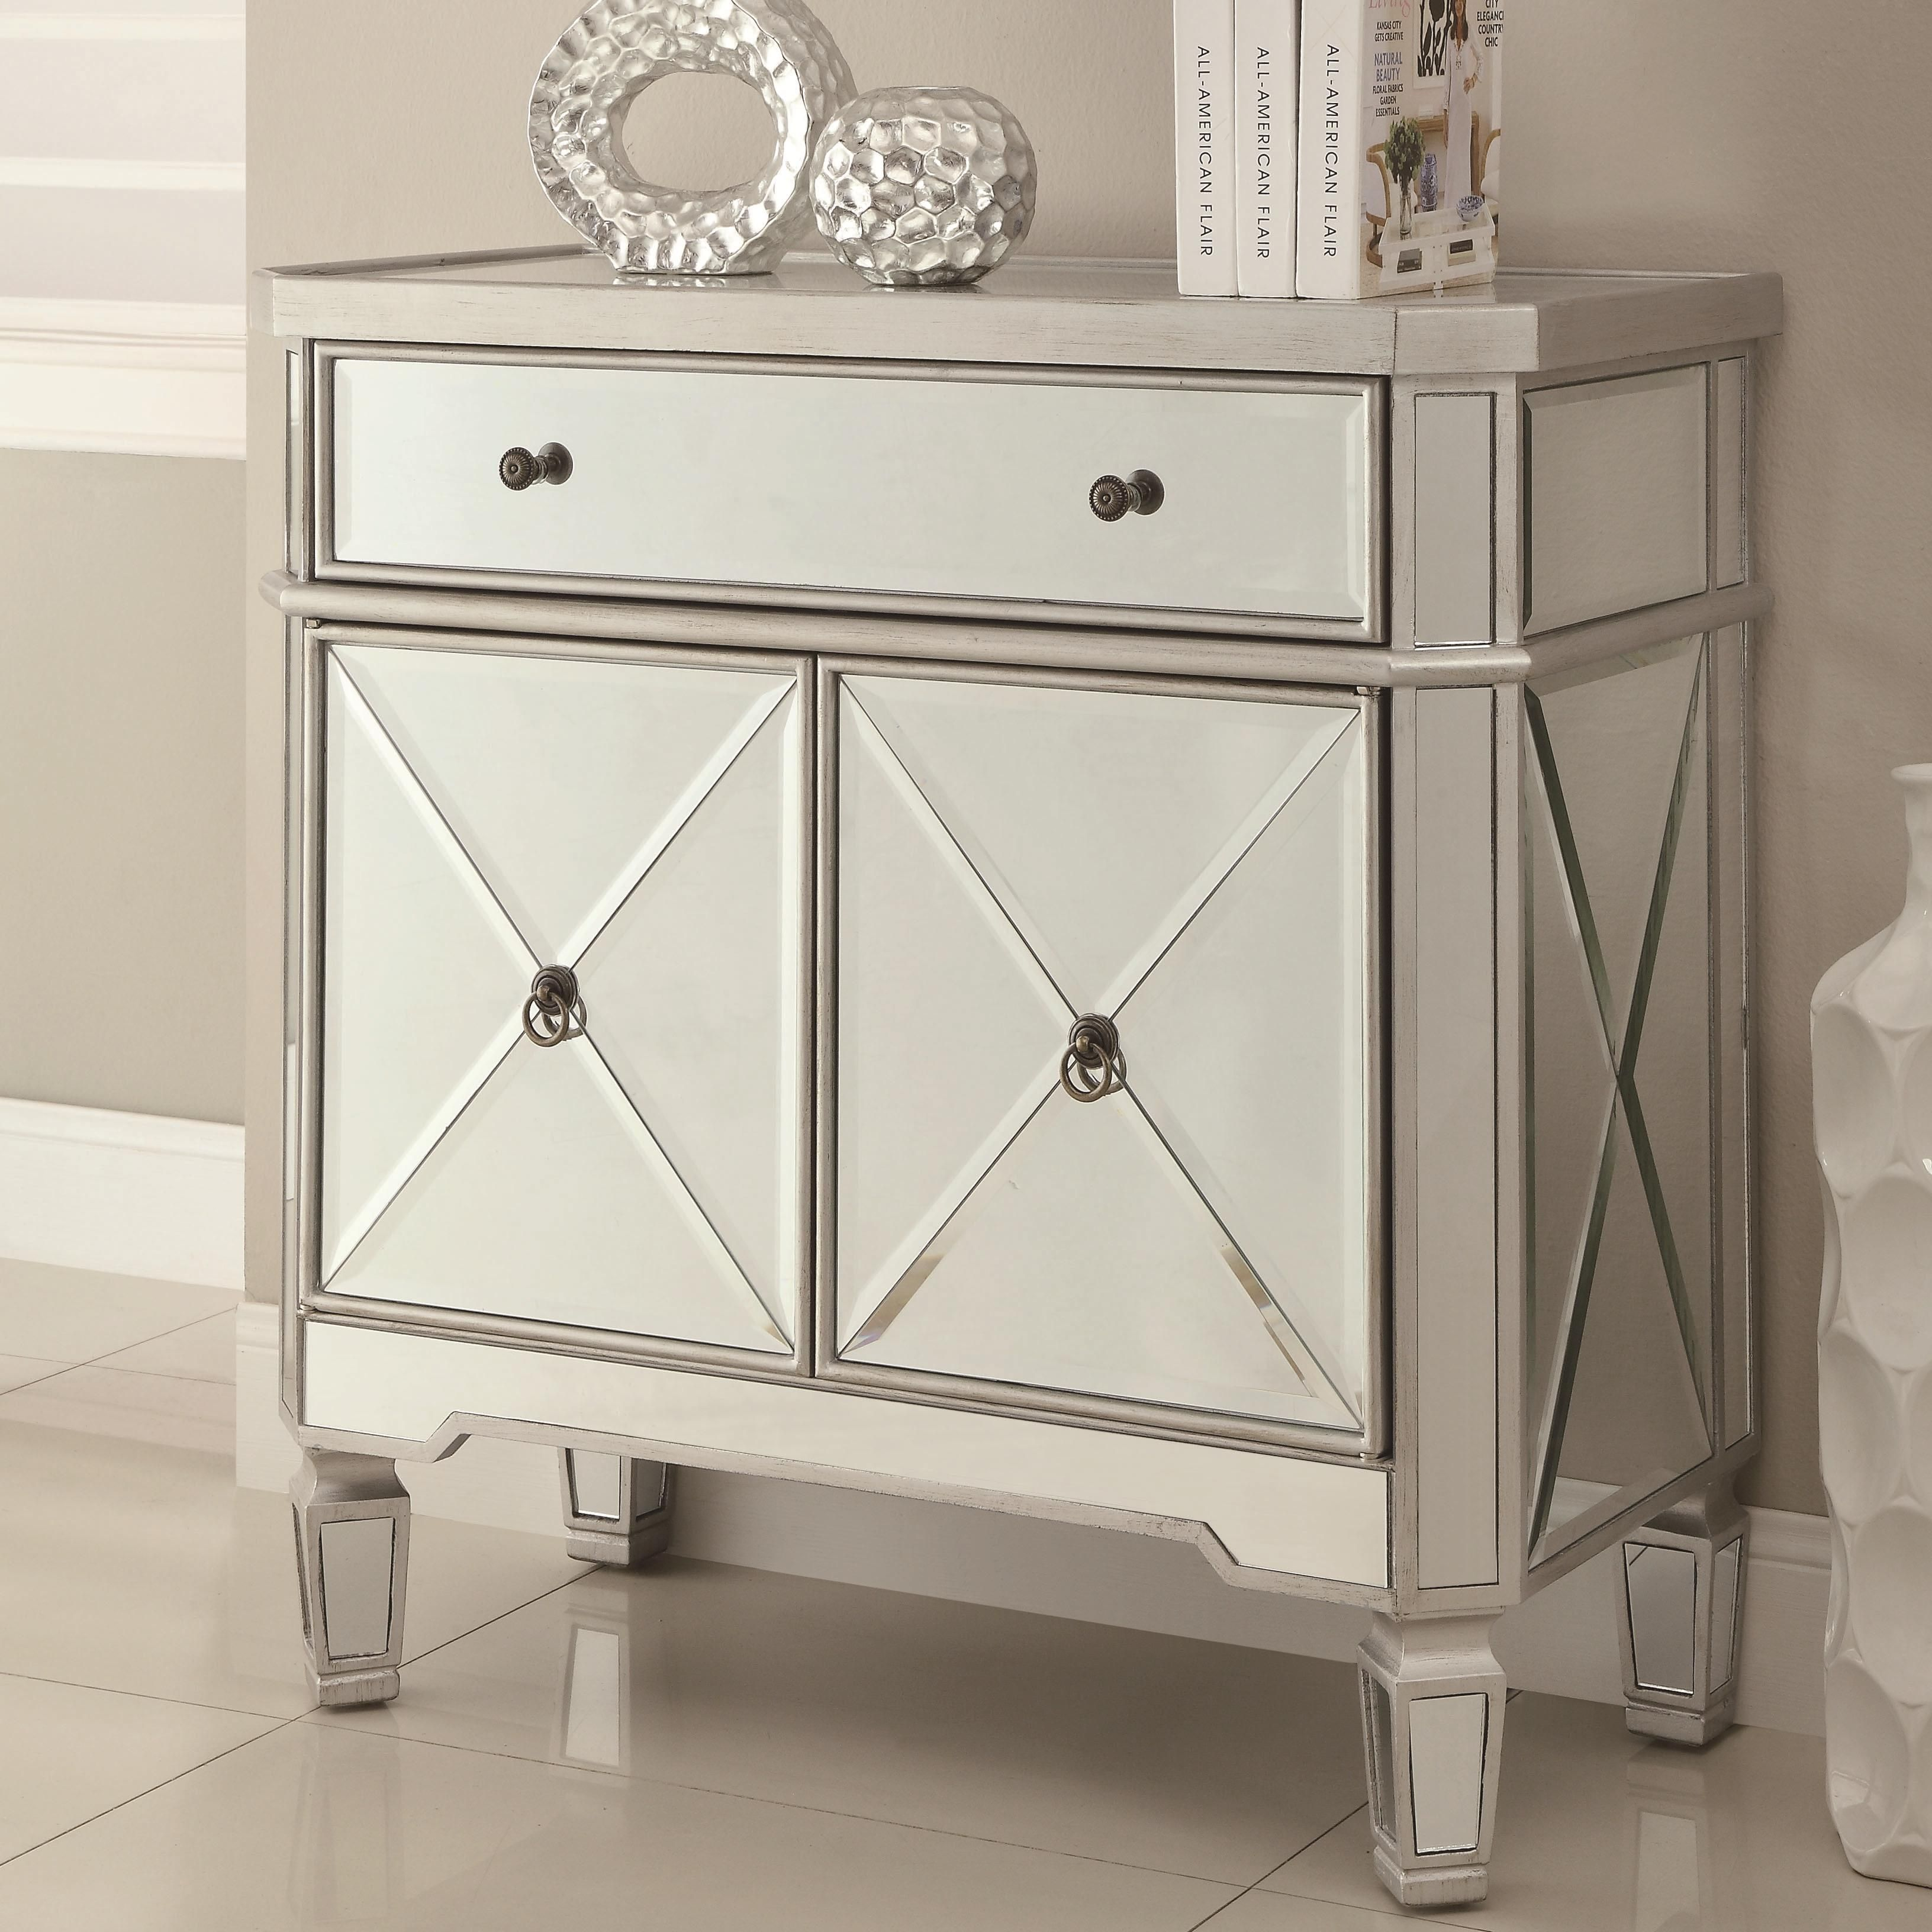 inset cabinet hood pin decor white decorative range shaker cabinets